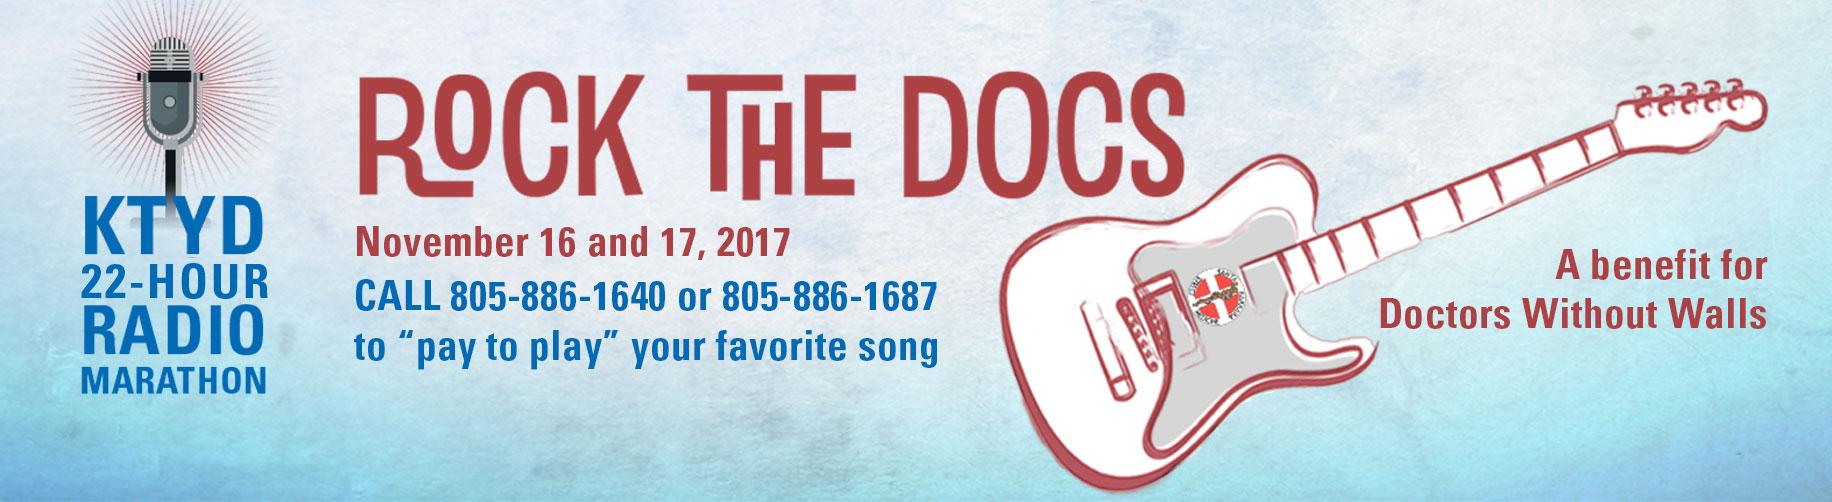 KTYD Rock the Docs Radioathon